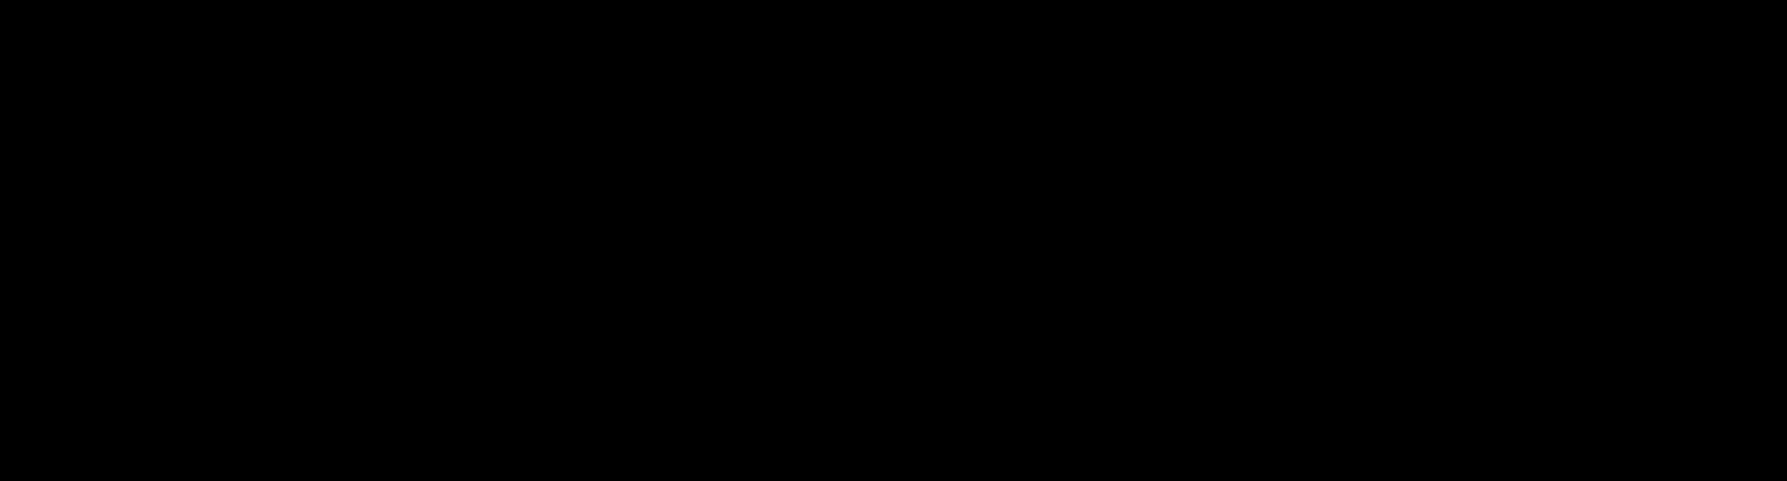 Aprotinin Hydrochloride